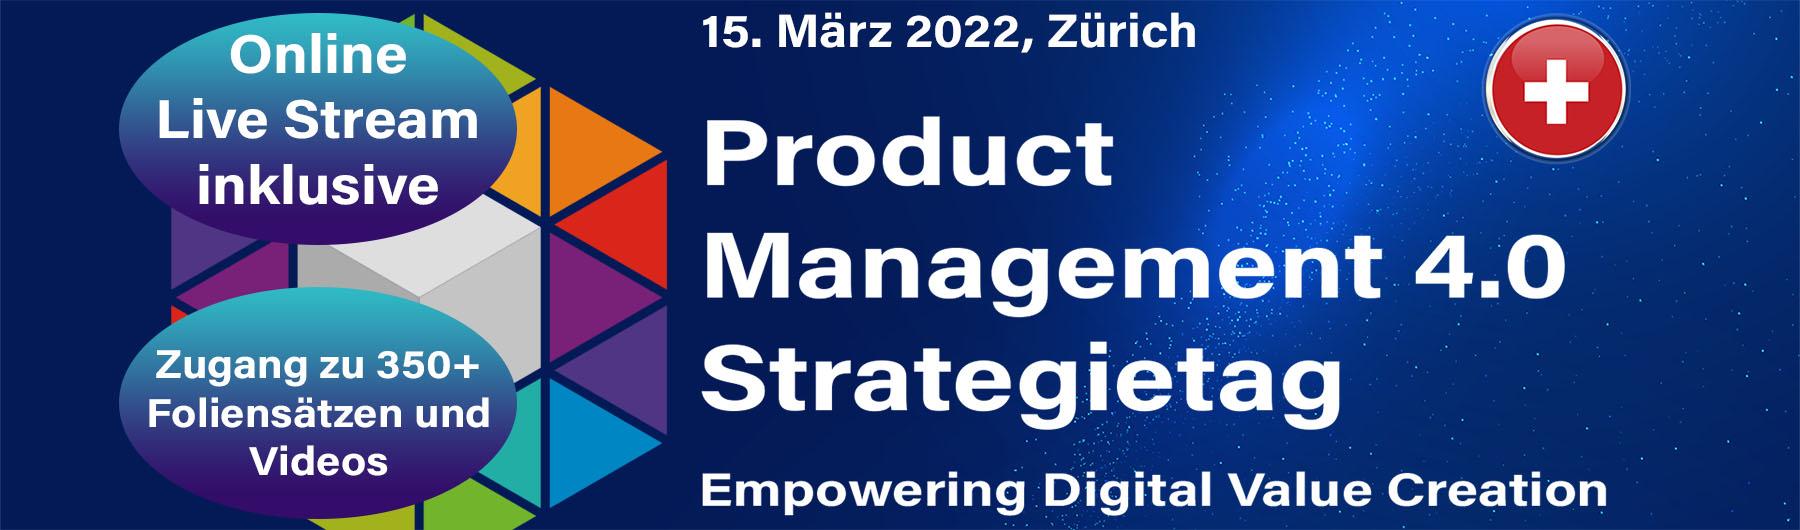 Product Management 4.0 Strategietag 2022